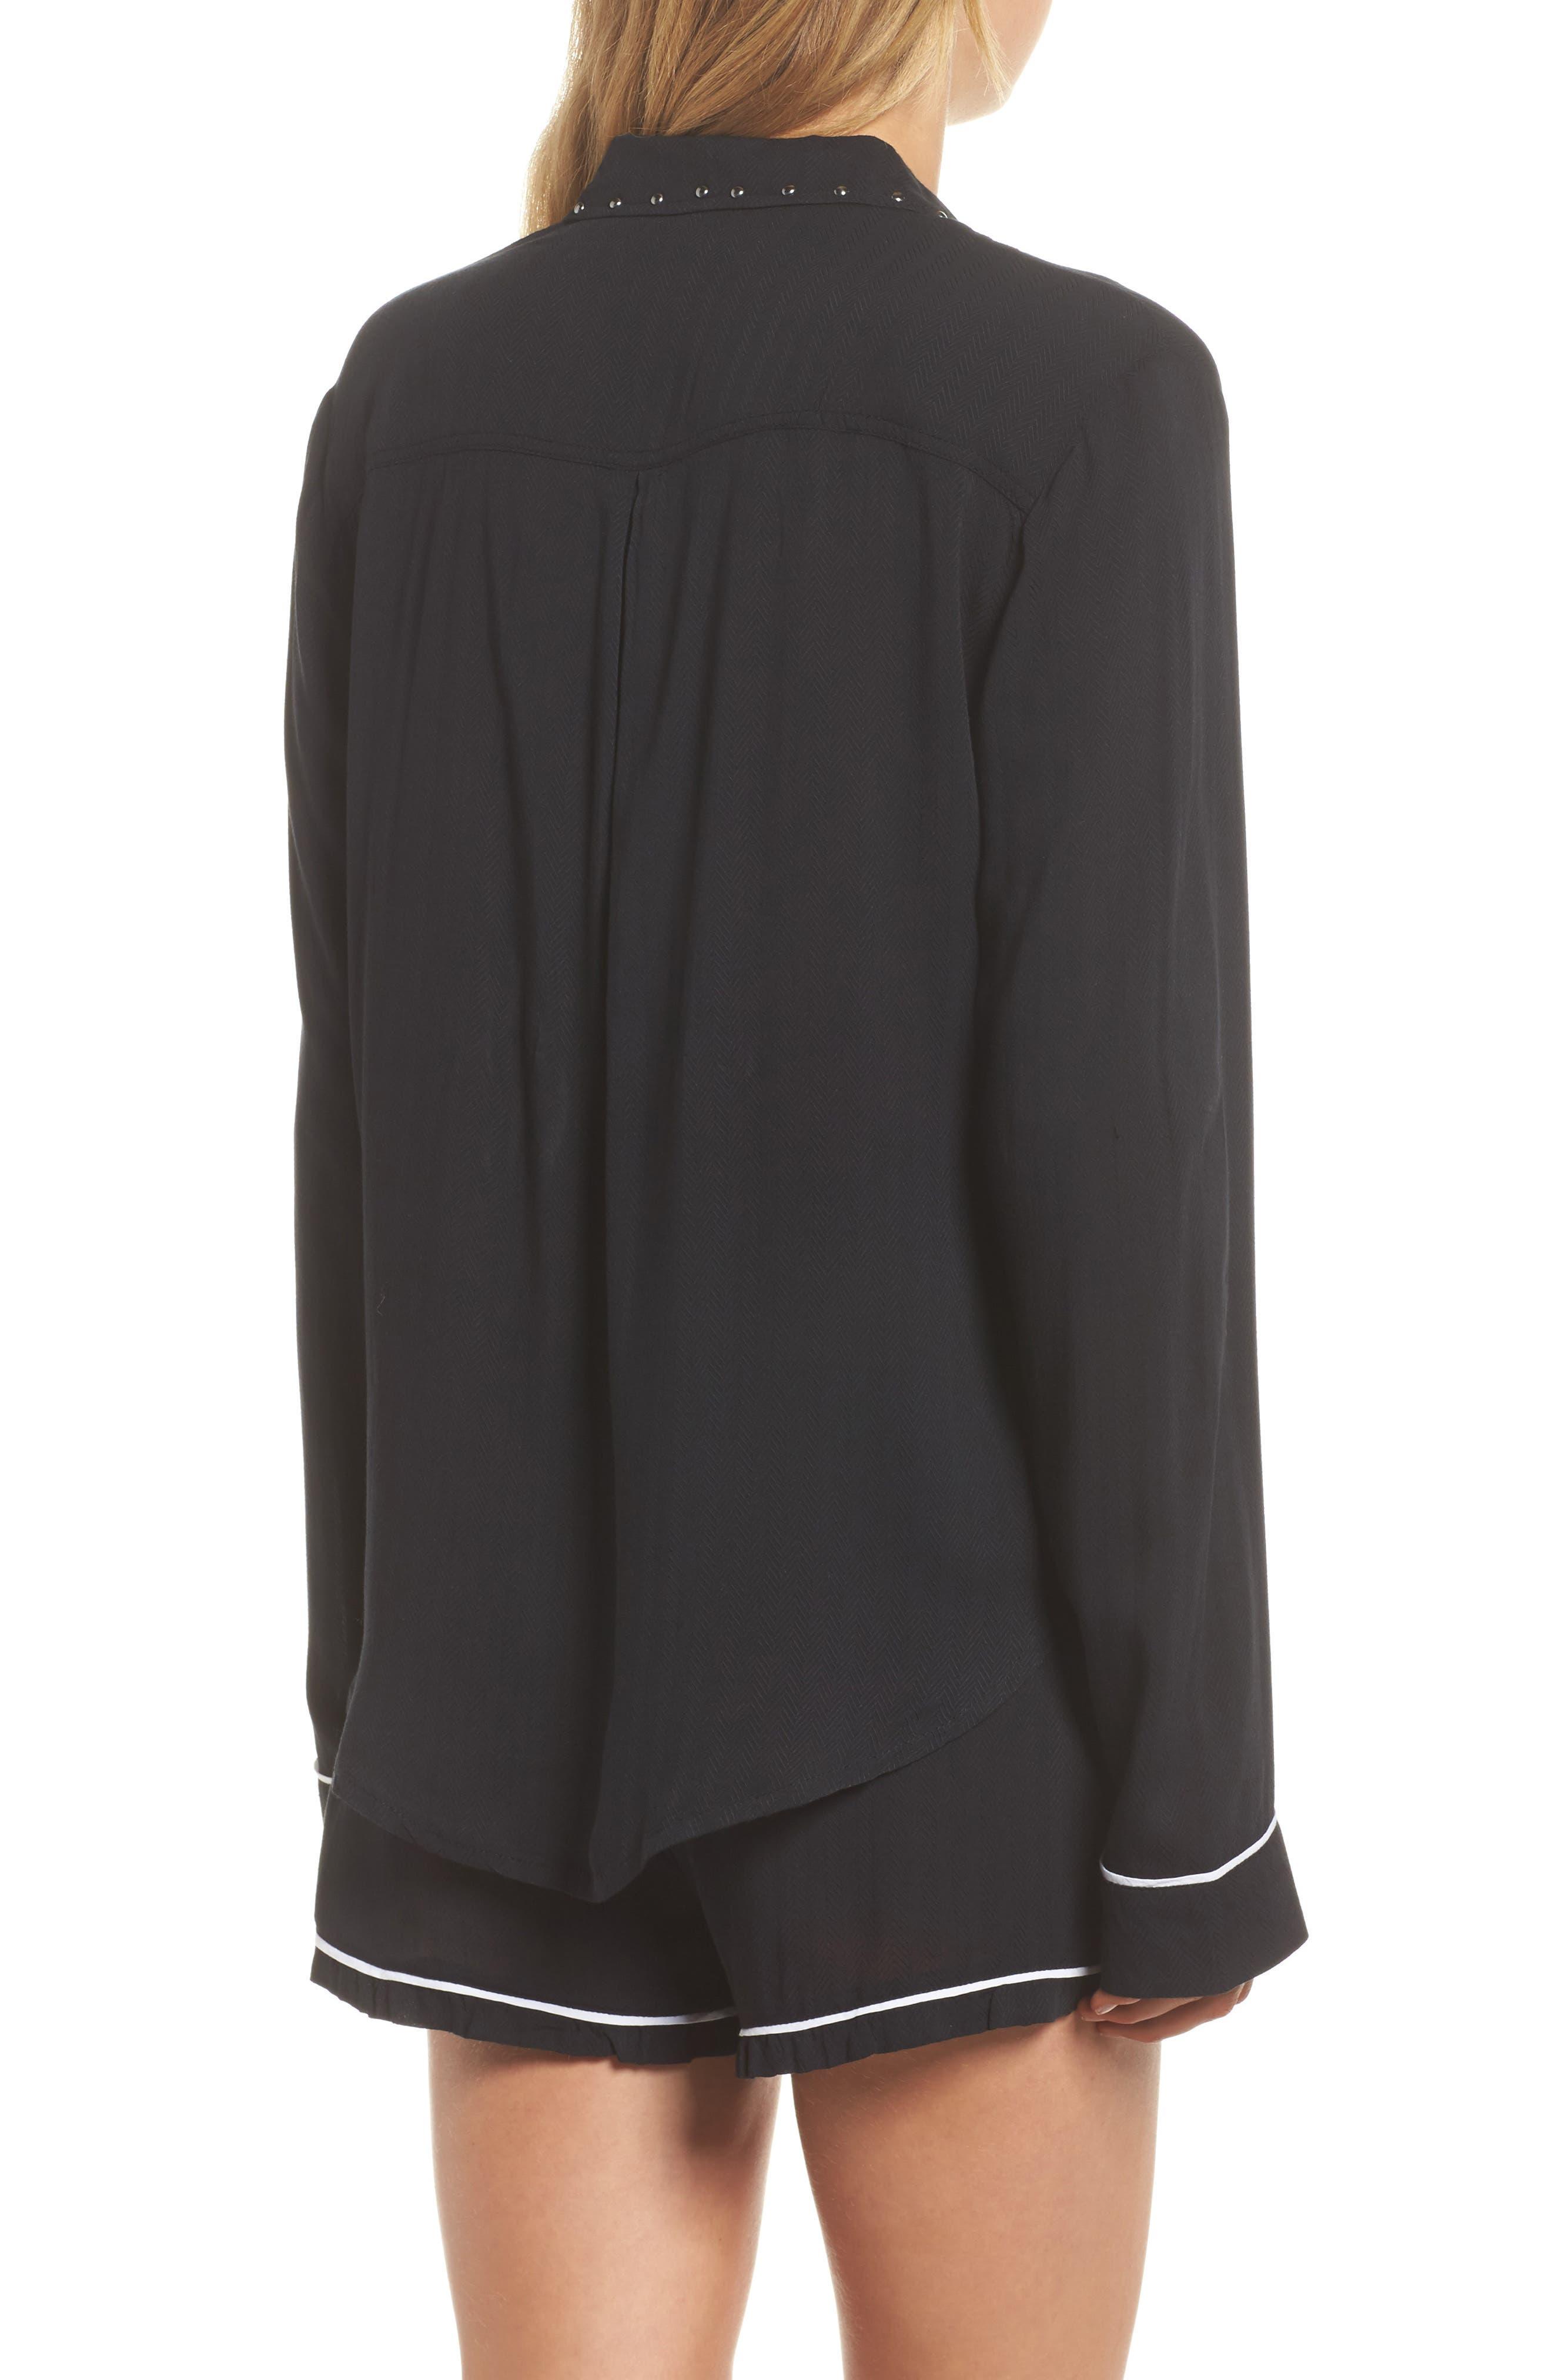 Short Pajamas,                             Alternate thumbnail 2, color,                             Black